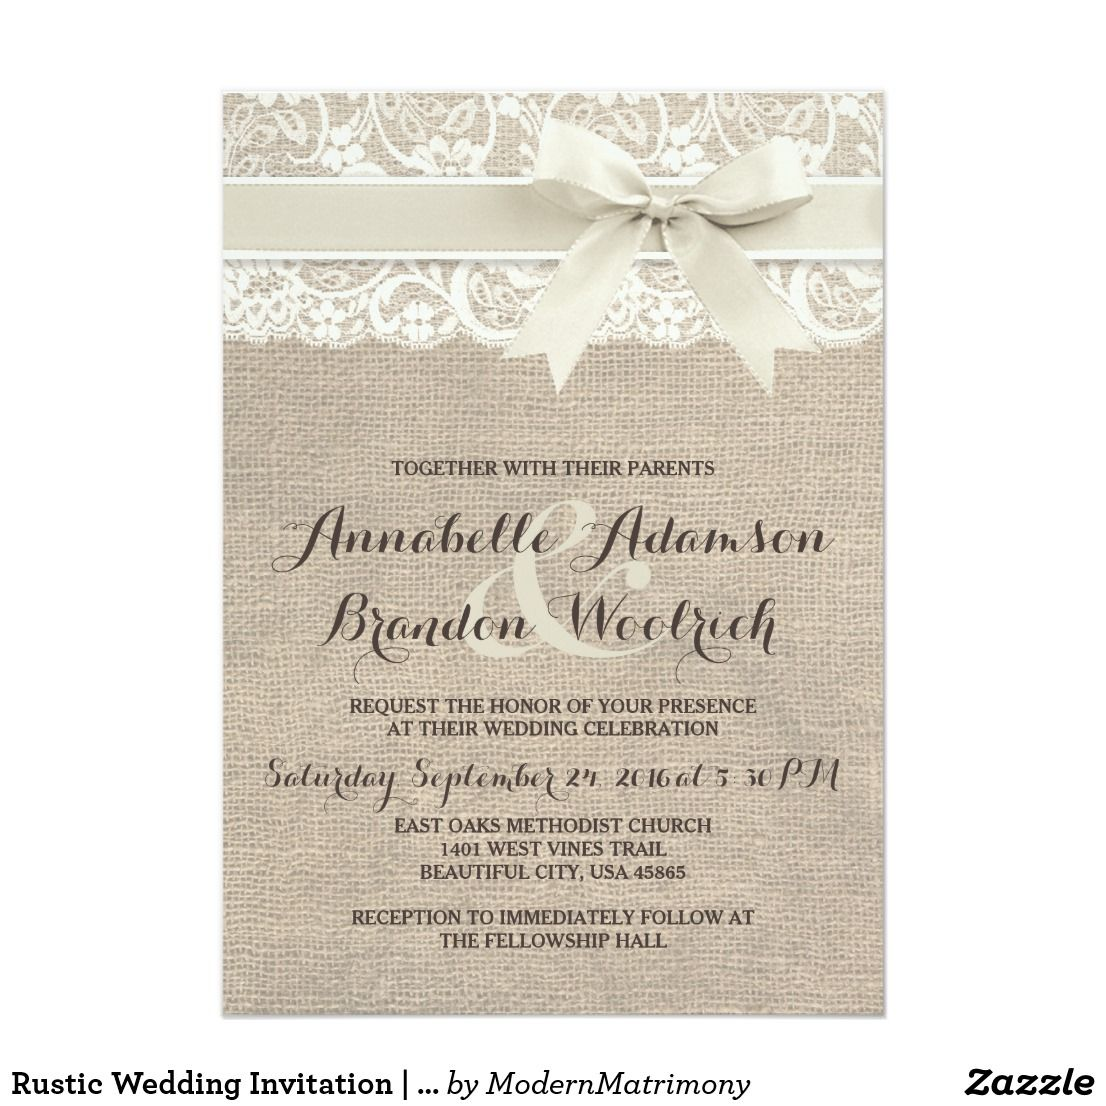 Rustic Wedding Invitation | Burlap Lace Bow Look